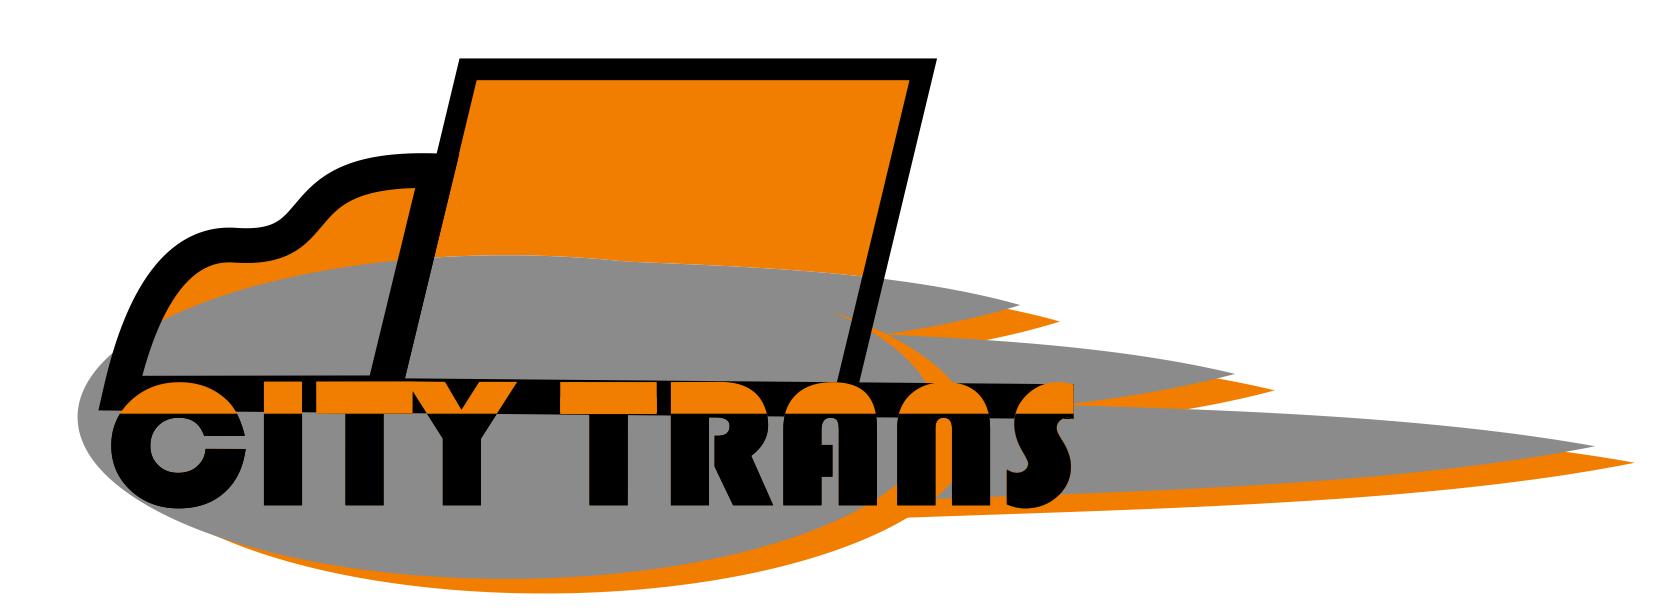 Разработка Логотипа транспортной компании фото f_9935e6e58fdf1b66.png